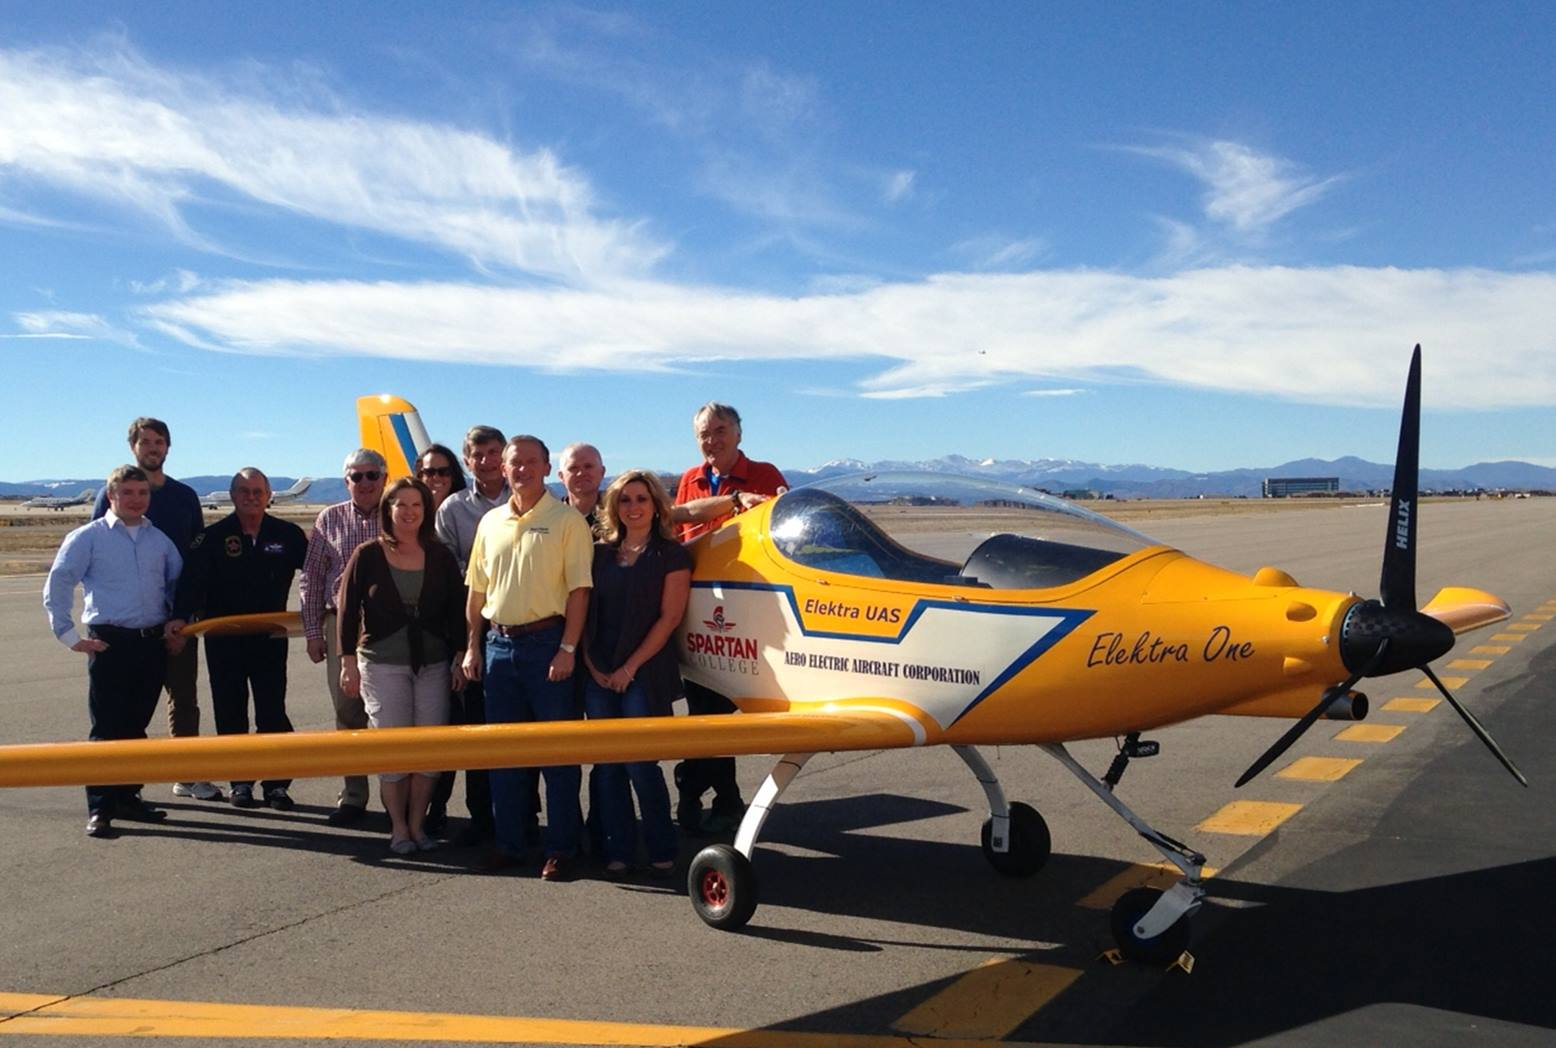 Experience the Sun Flyer Electric Aircraft at Sun n' Fun